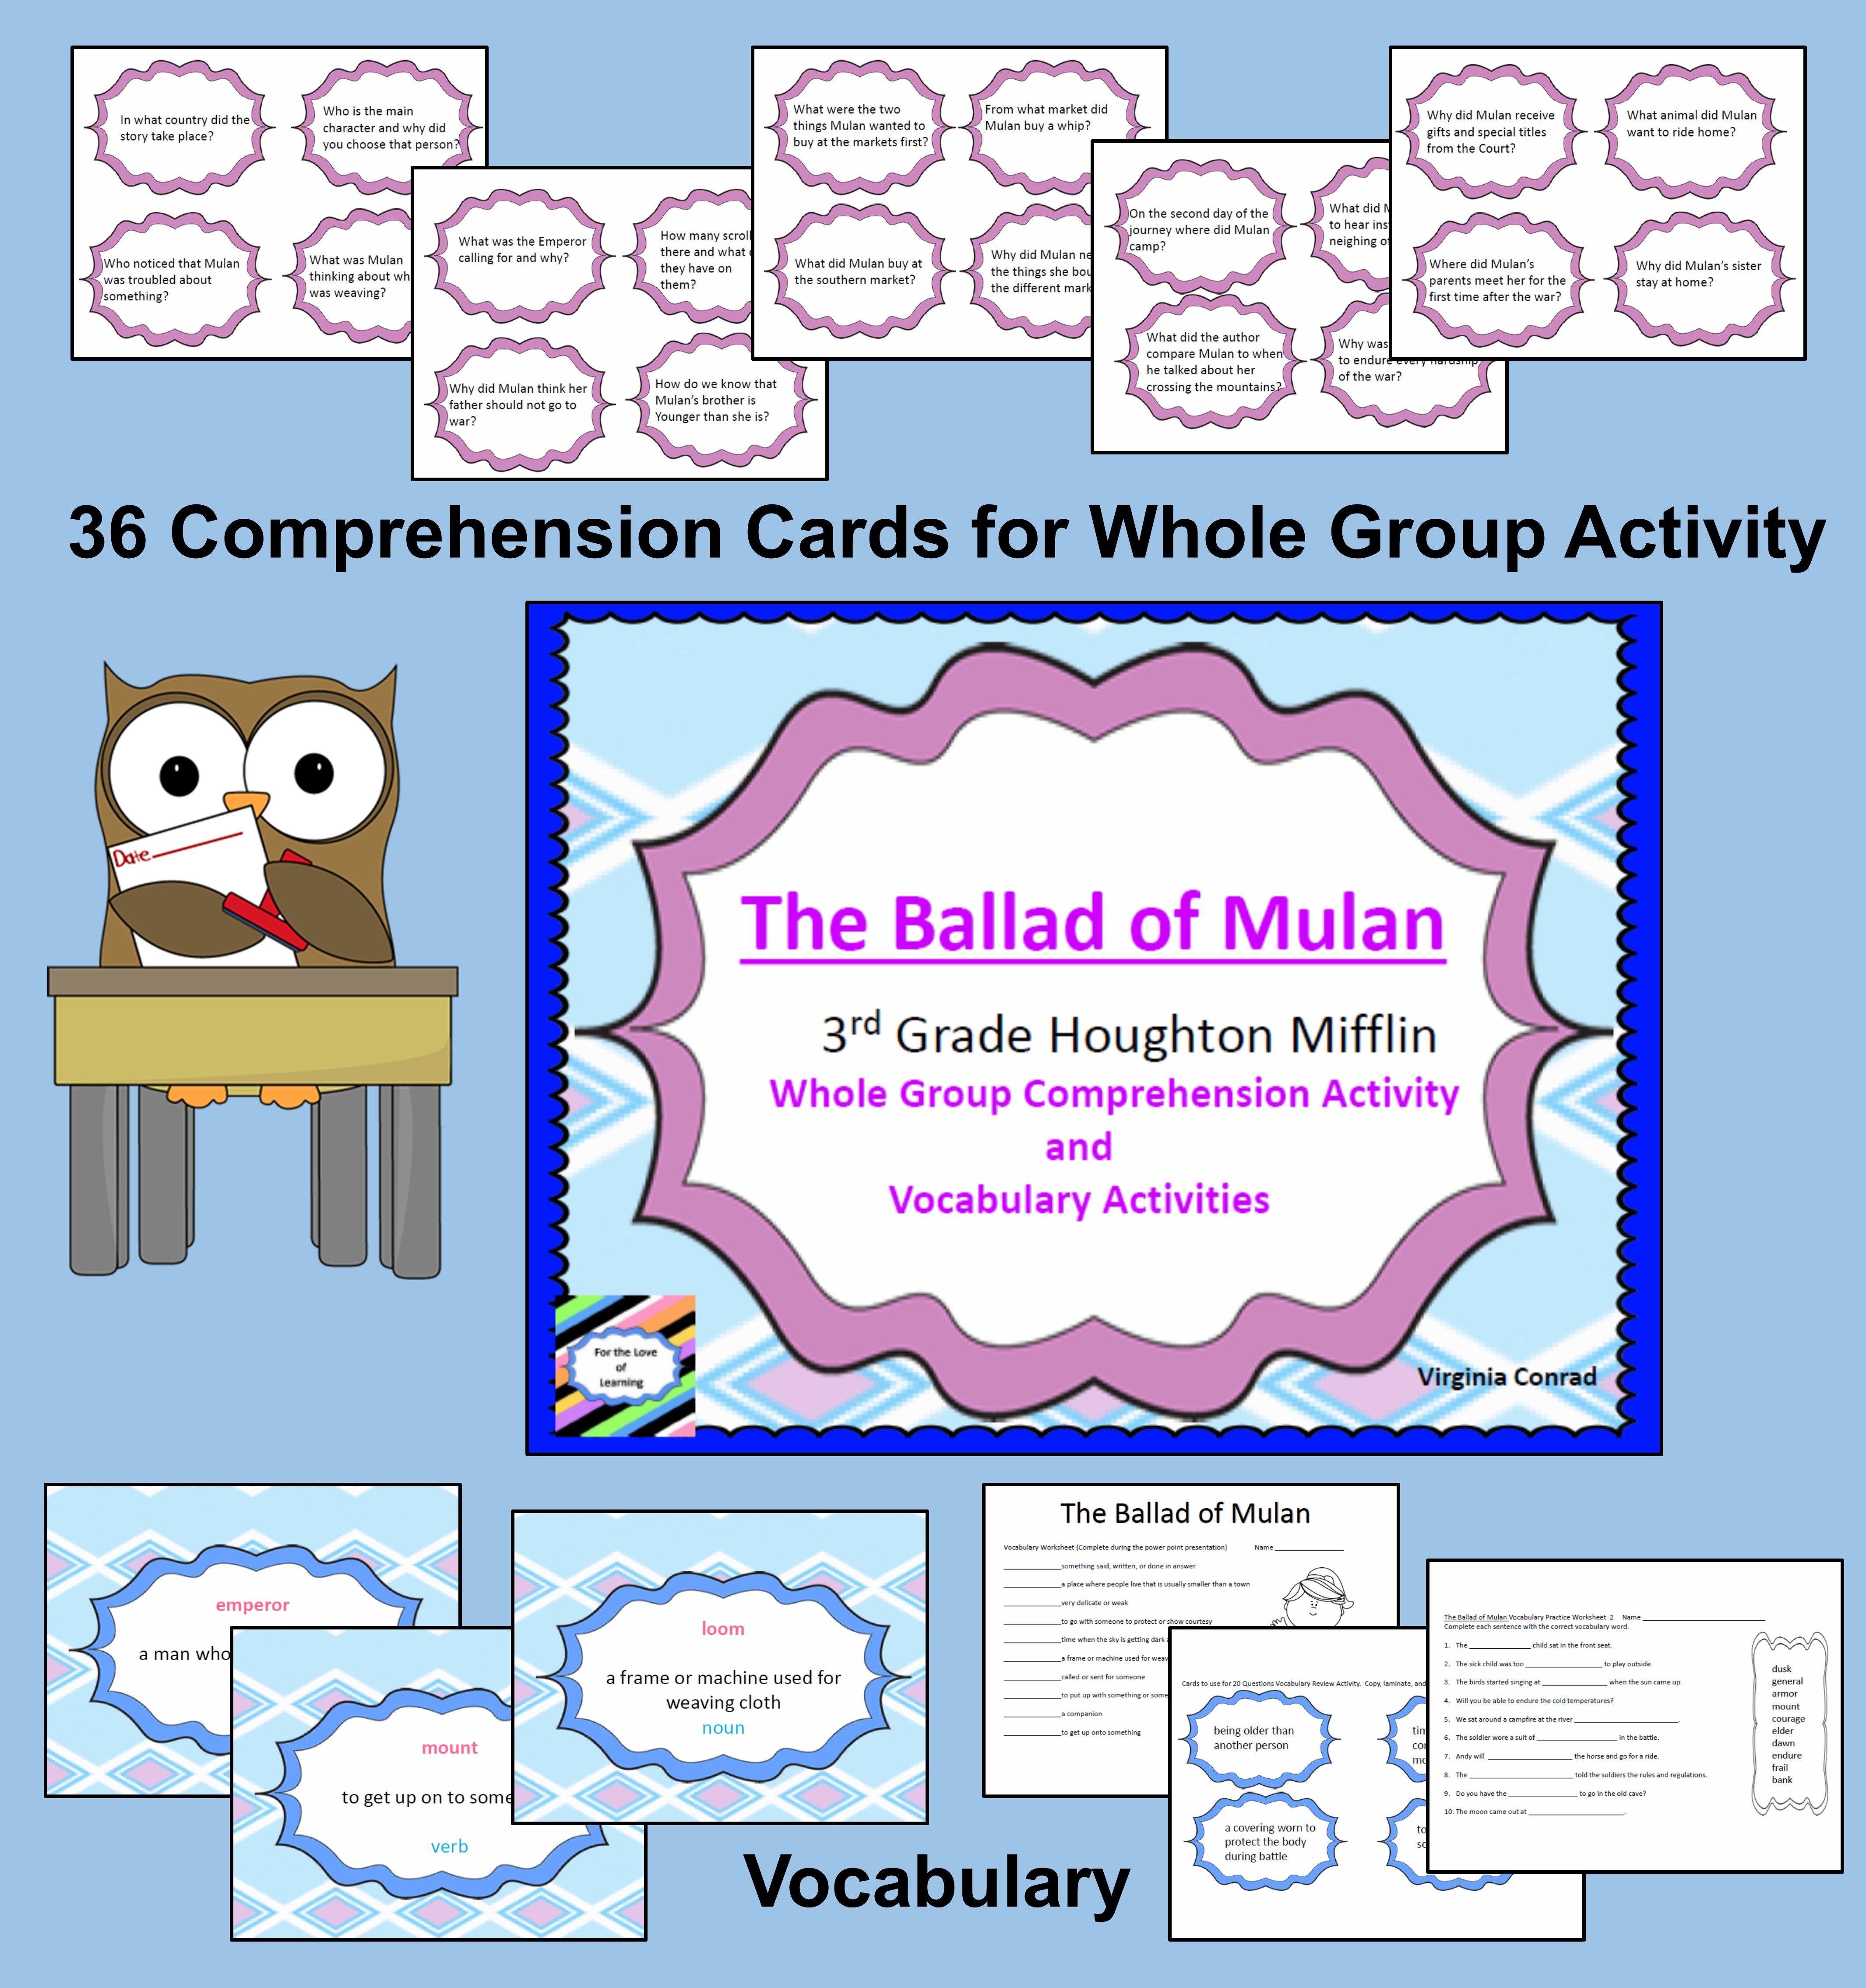 Ballad Of Mulan Vocab And Comprehension Houghton Mifflin